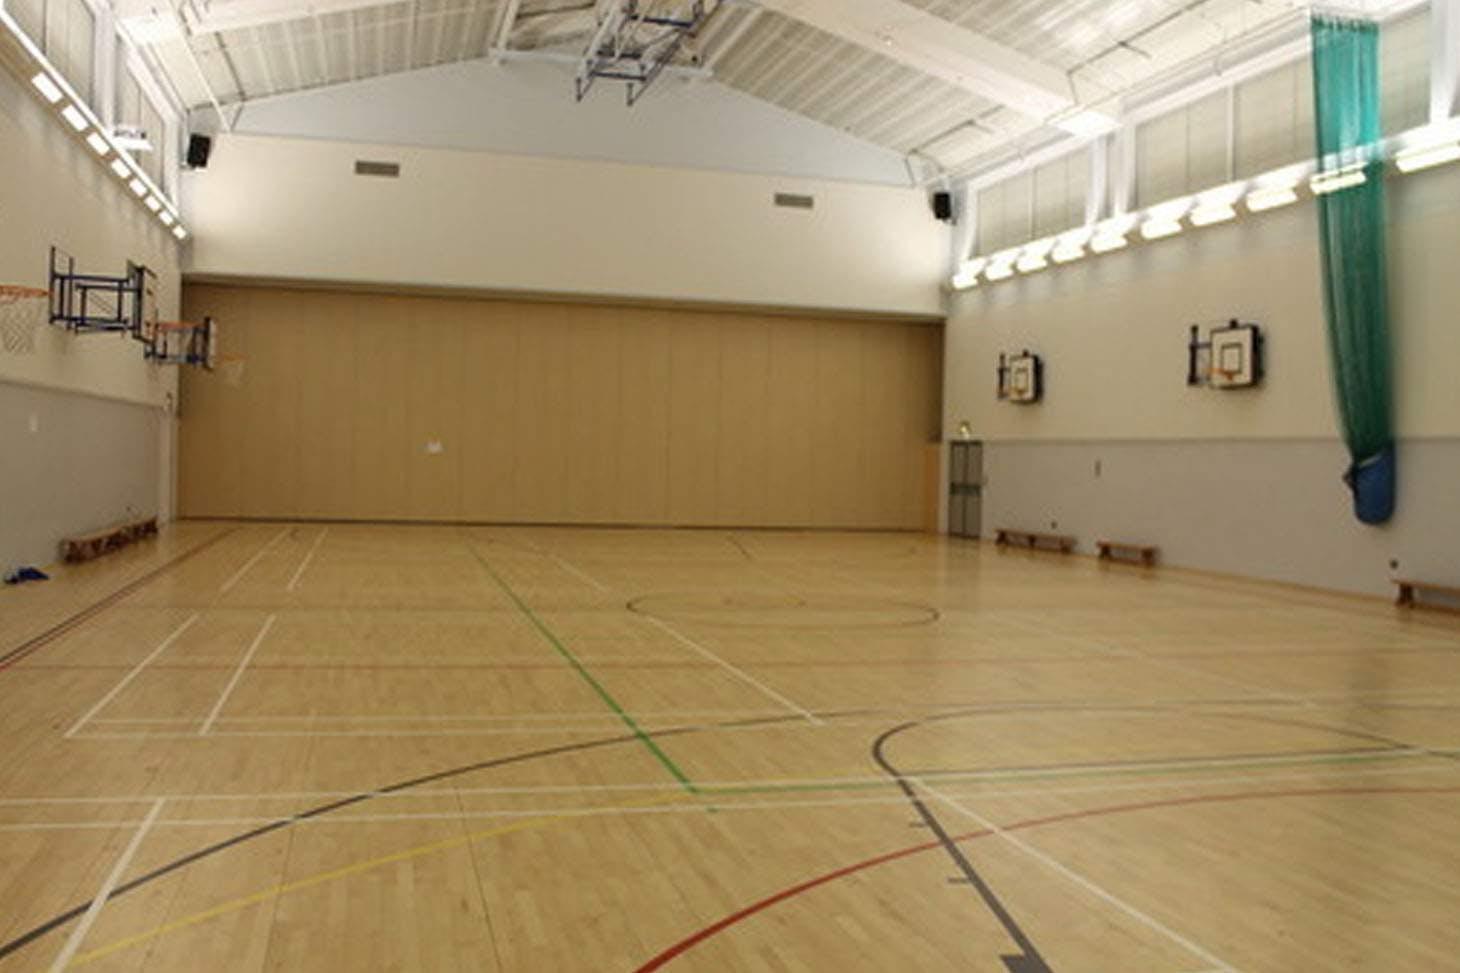 Whitburn C of E Academy Indoor badminton court